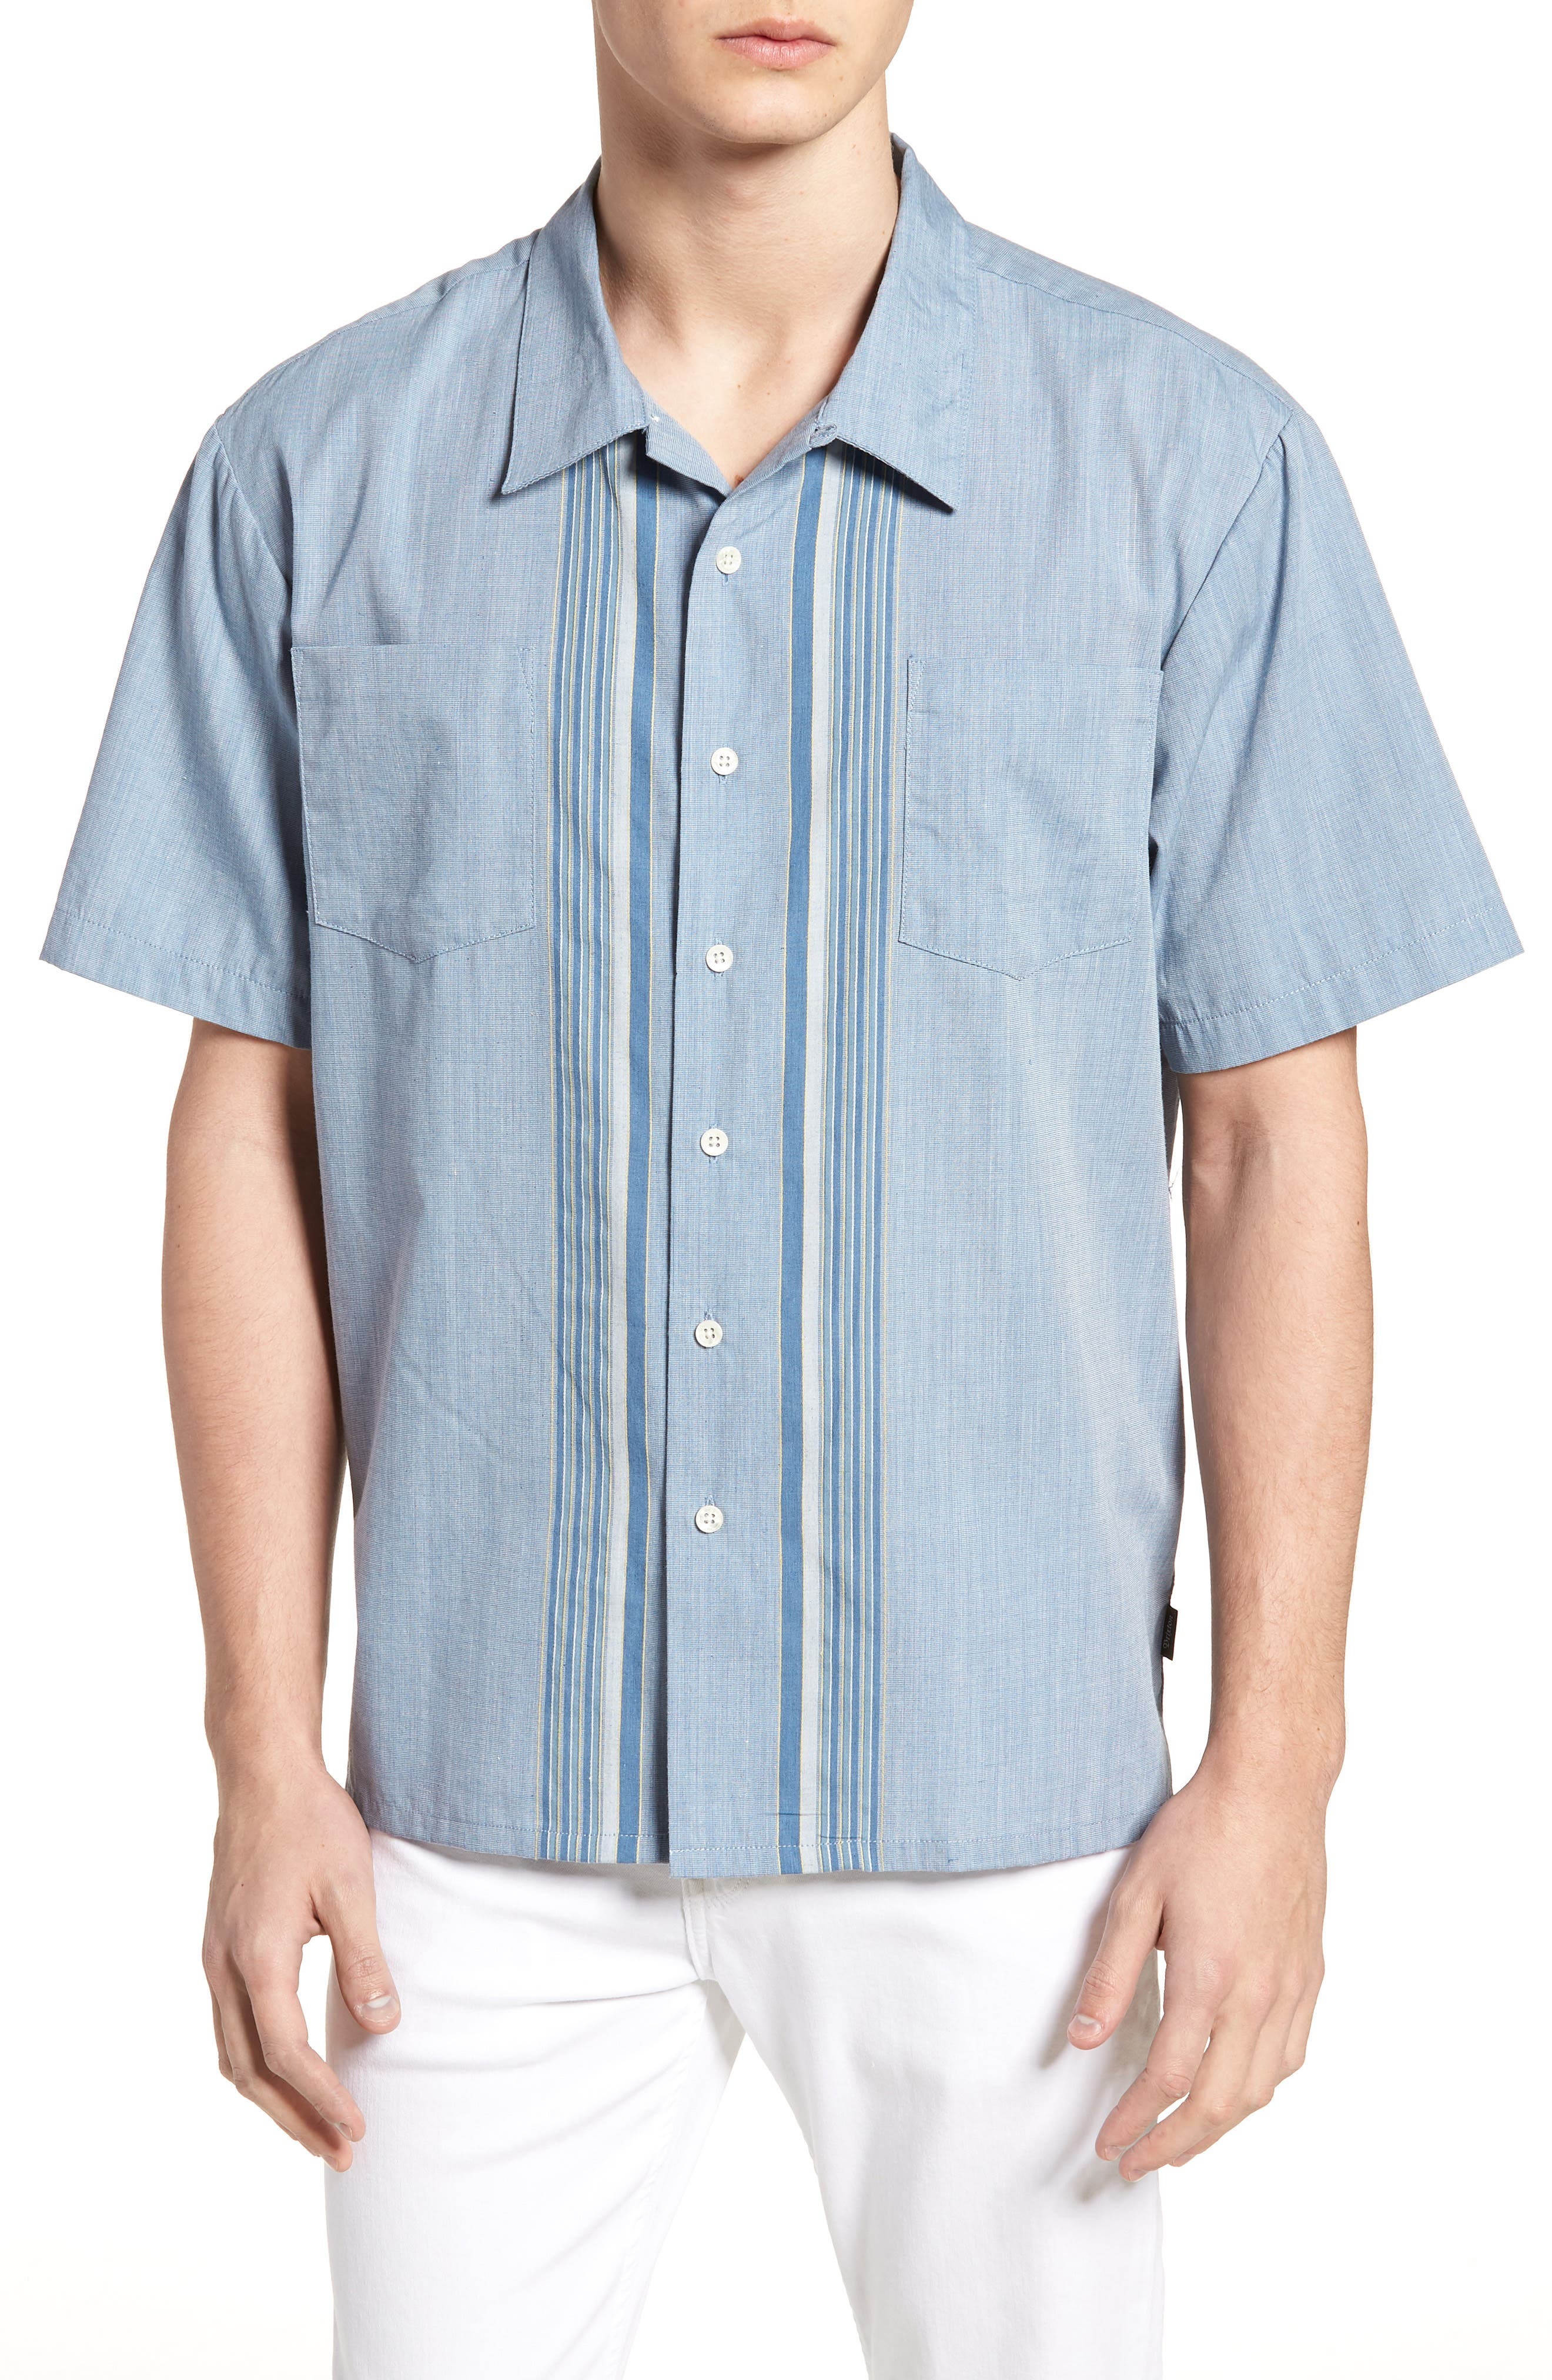 Cruze Woven Shirt,                             Main thumbnail 1, color,                             LIGHT BLUE